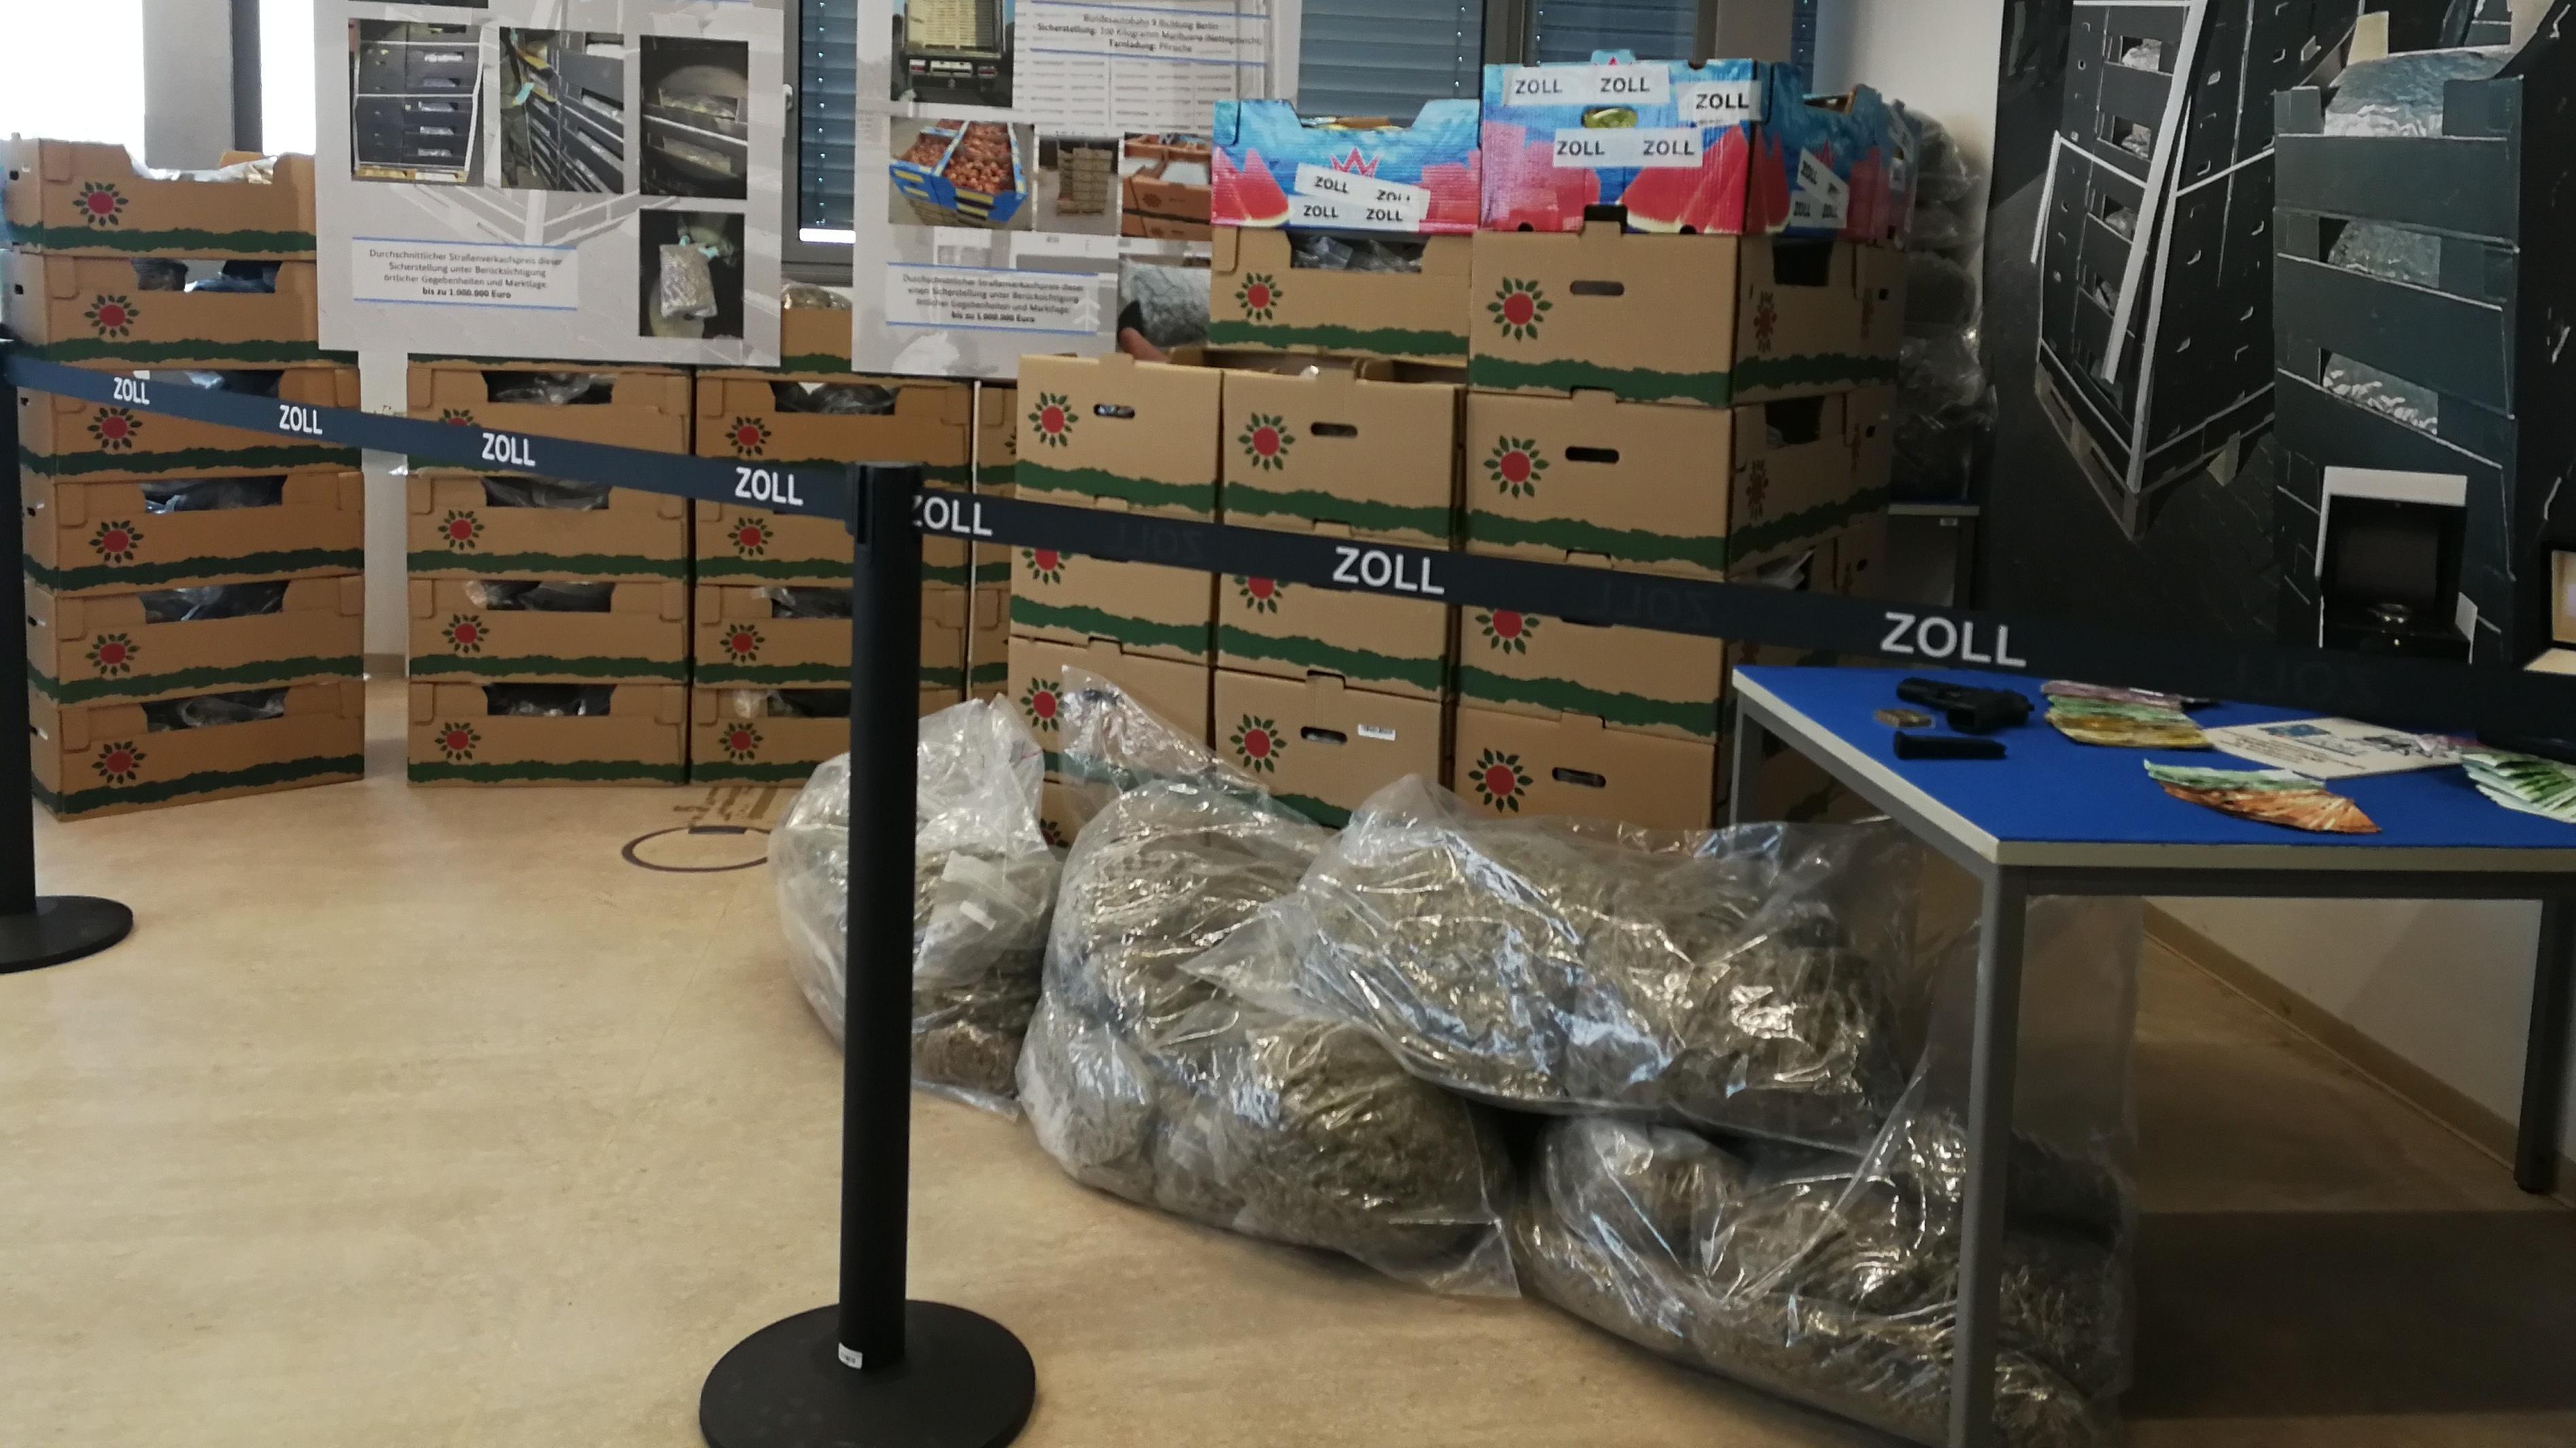 Fund der Ermittlungsgruppe Rauschgift: Kistenweise Marihuana